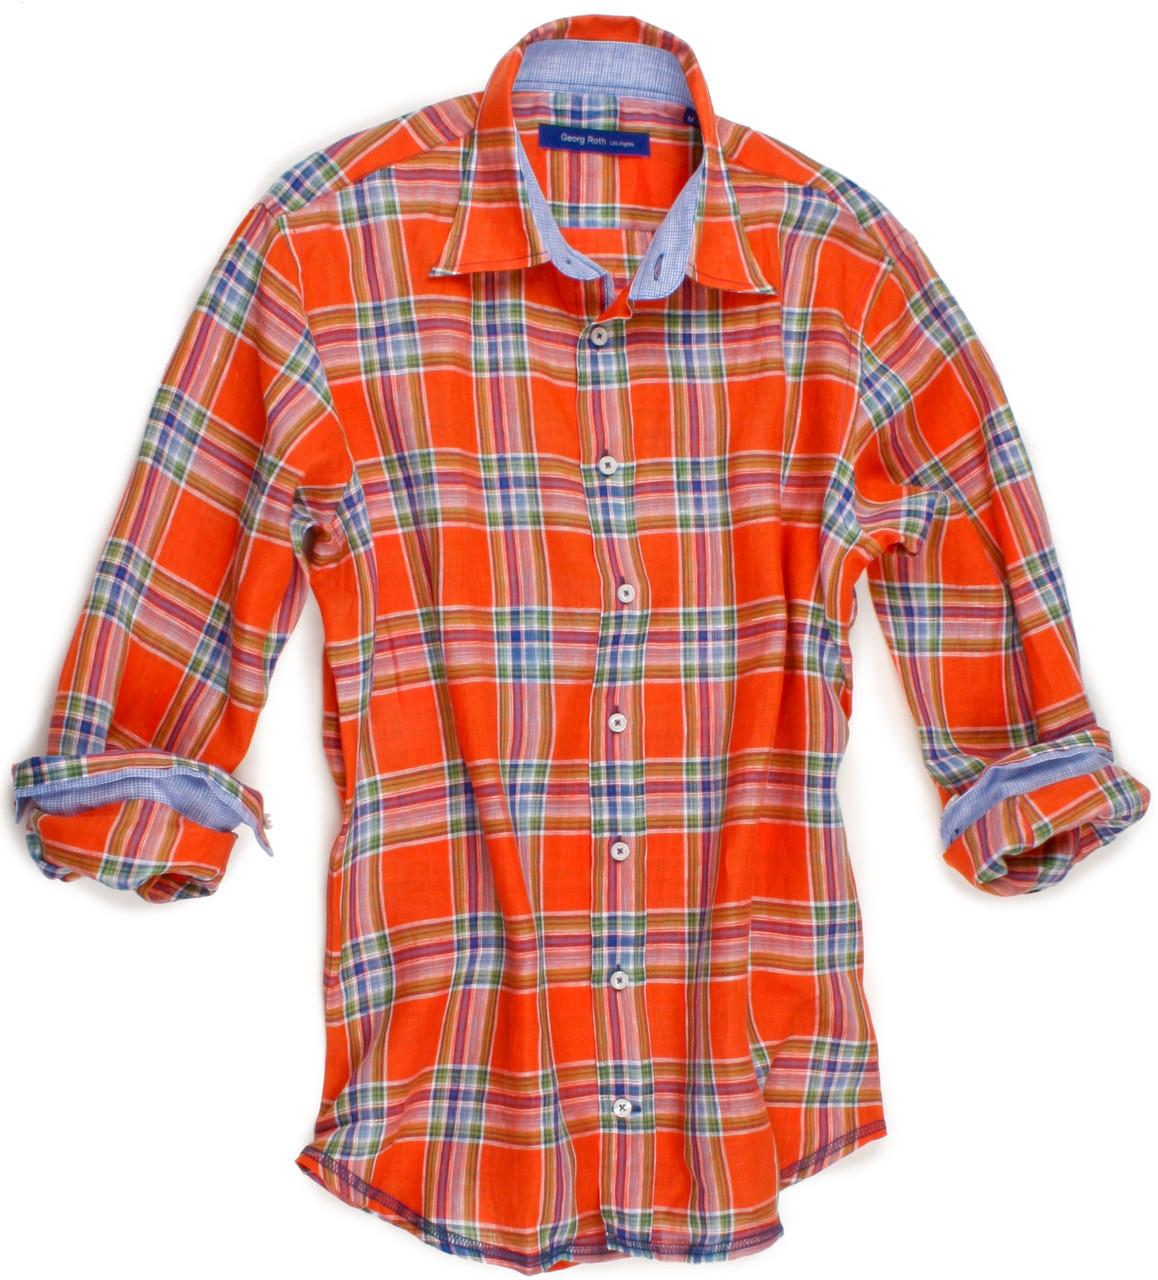 74824487d83 SKU  Georg Roth Sienna Sienna 60010-023 Long Sleeves-Men s Shirt GRLA  UPC   Orange